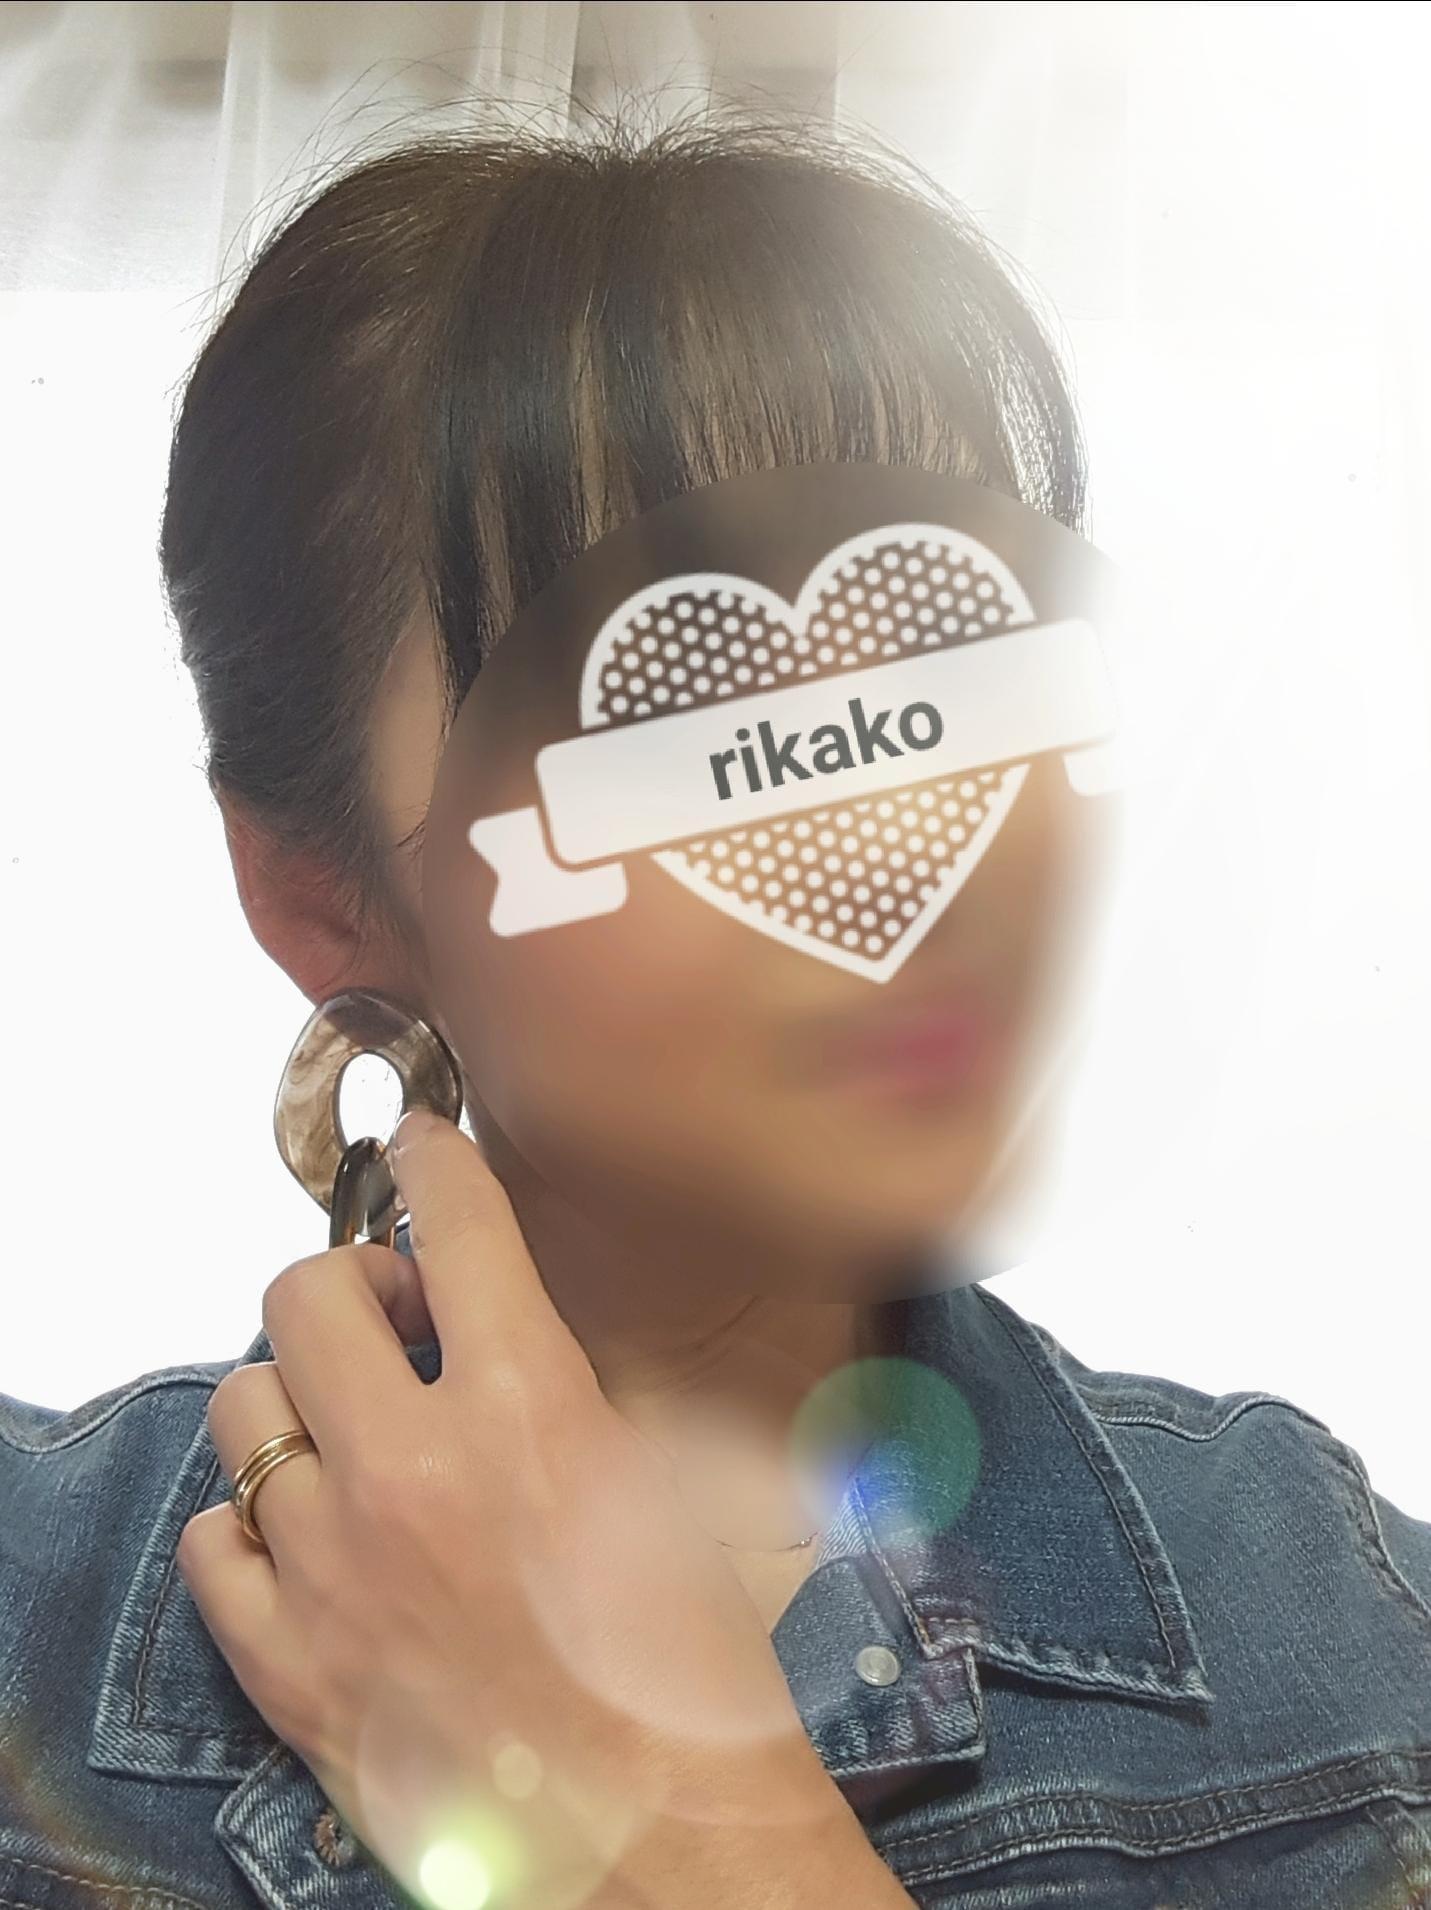 「K様へ★」03/21(03/21) 15:08 | 梨花子の写メ・風俗動画